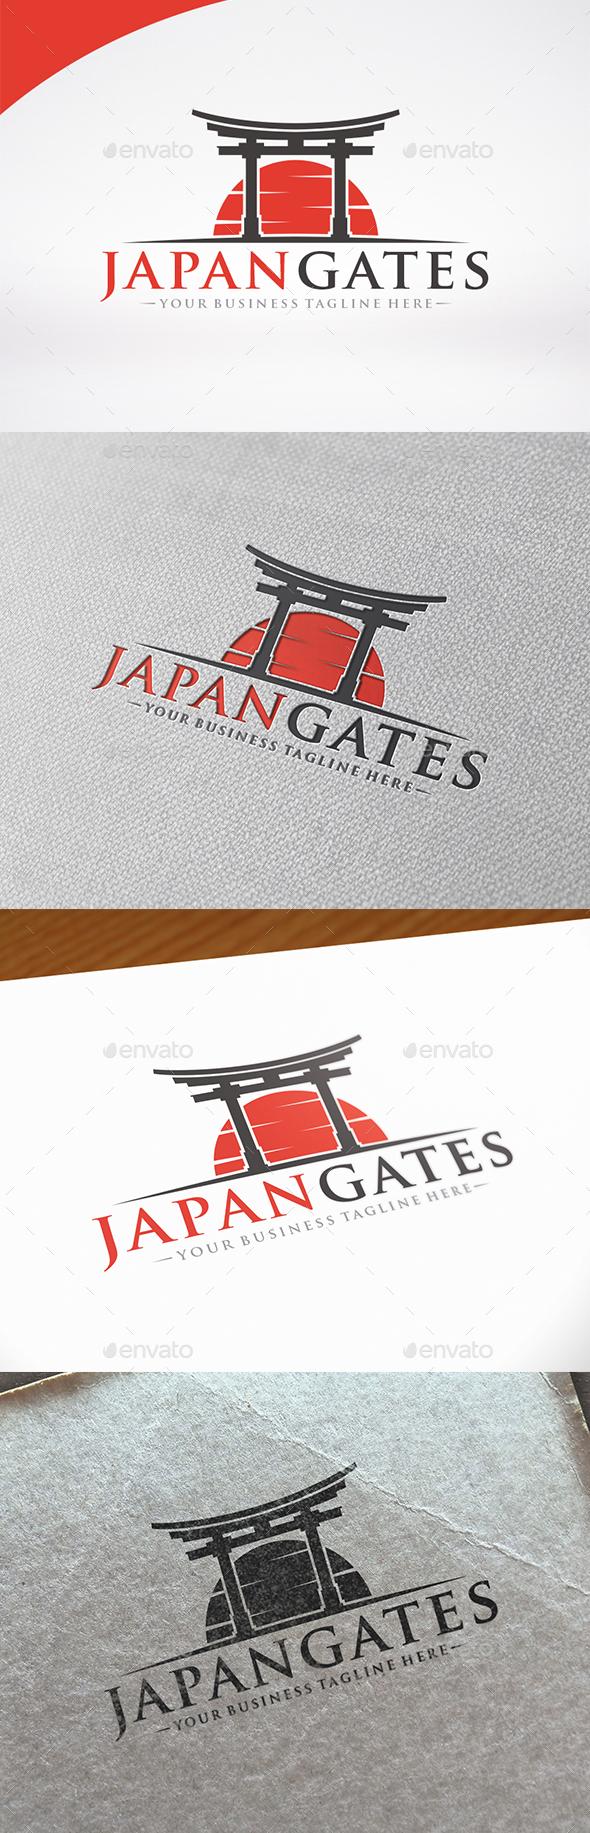 Japan Gate Logo Template - Buildings Logo Templates